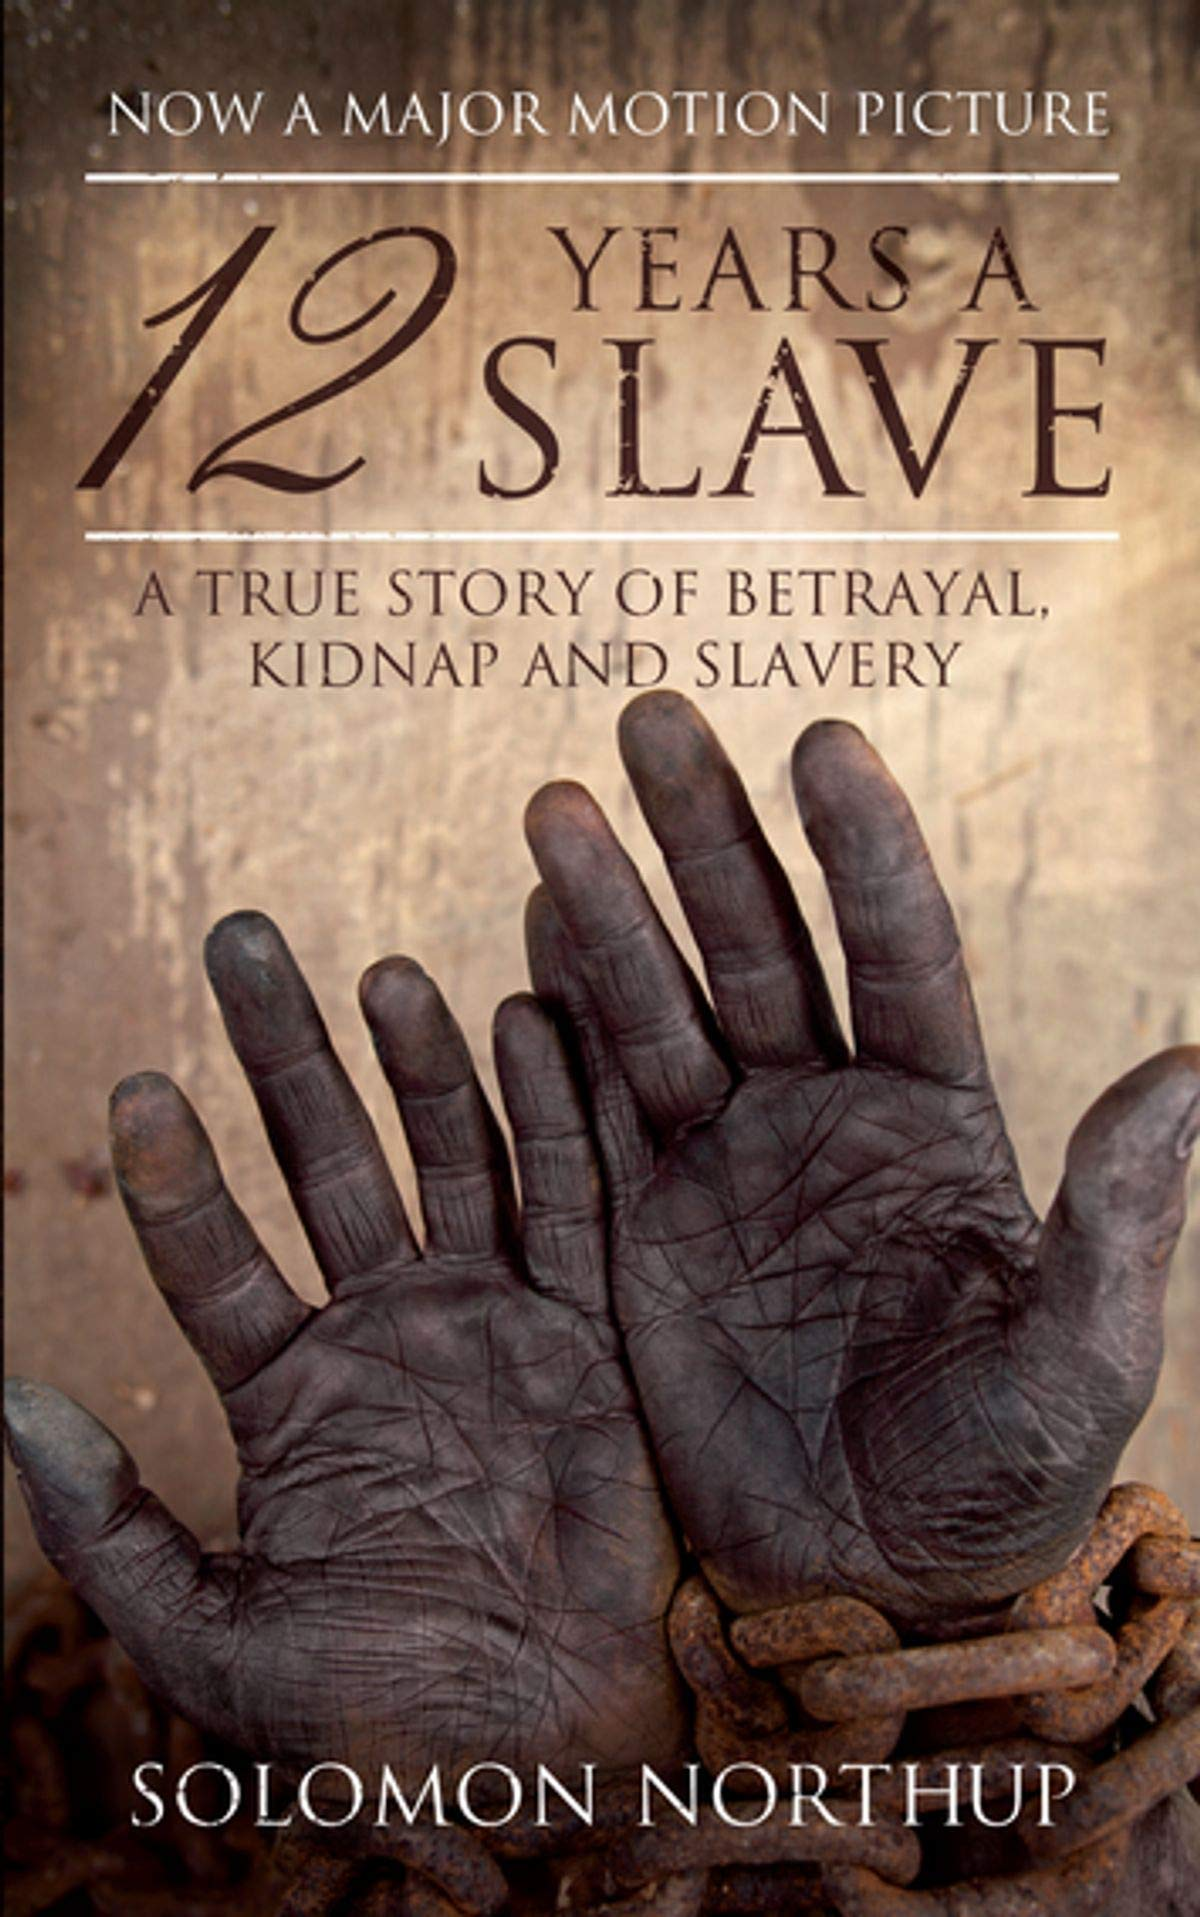 Twelve years a slave: Memoir and Narration